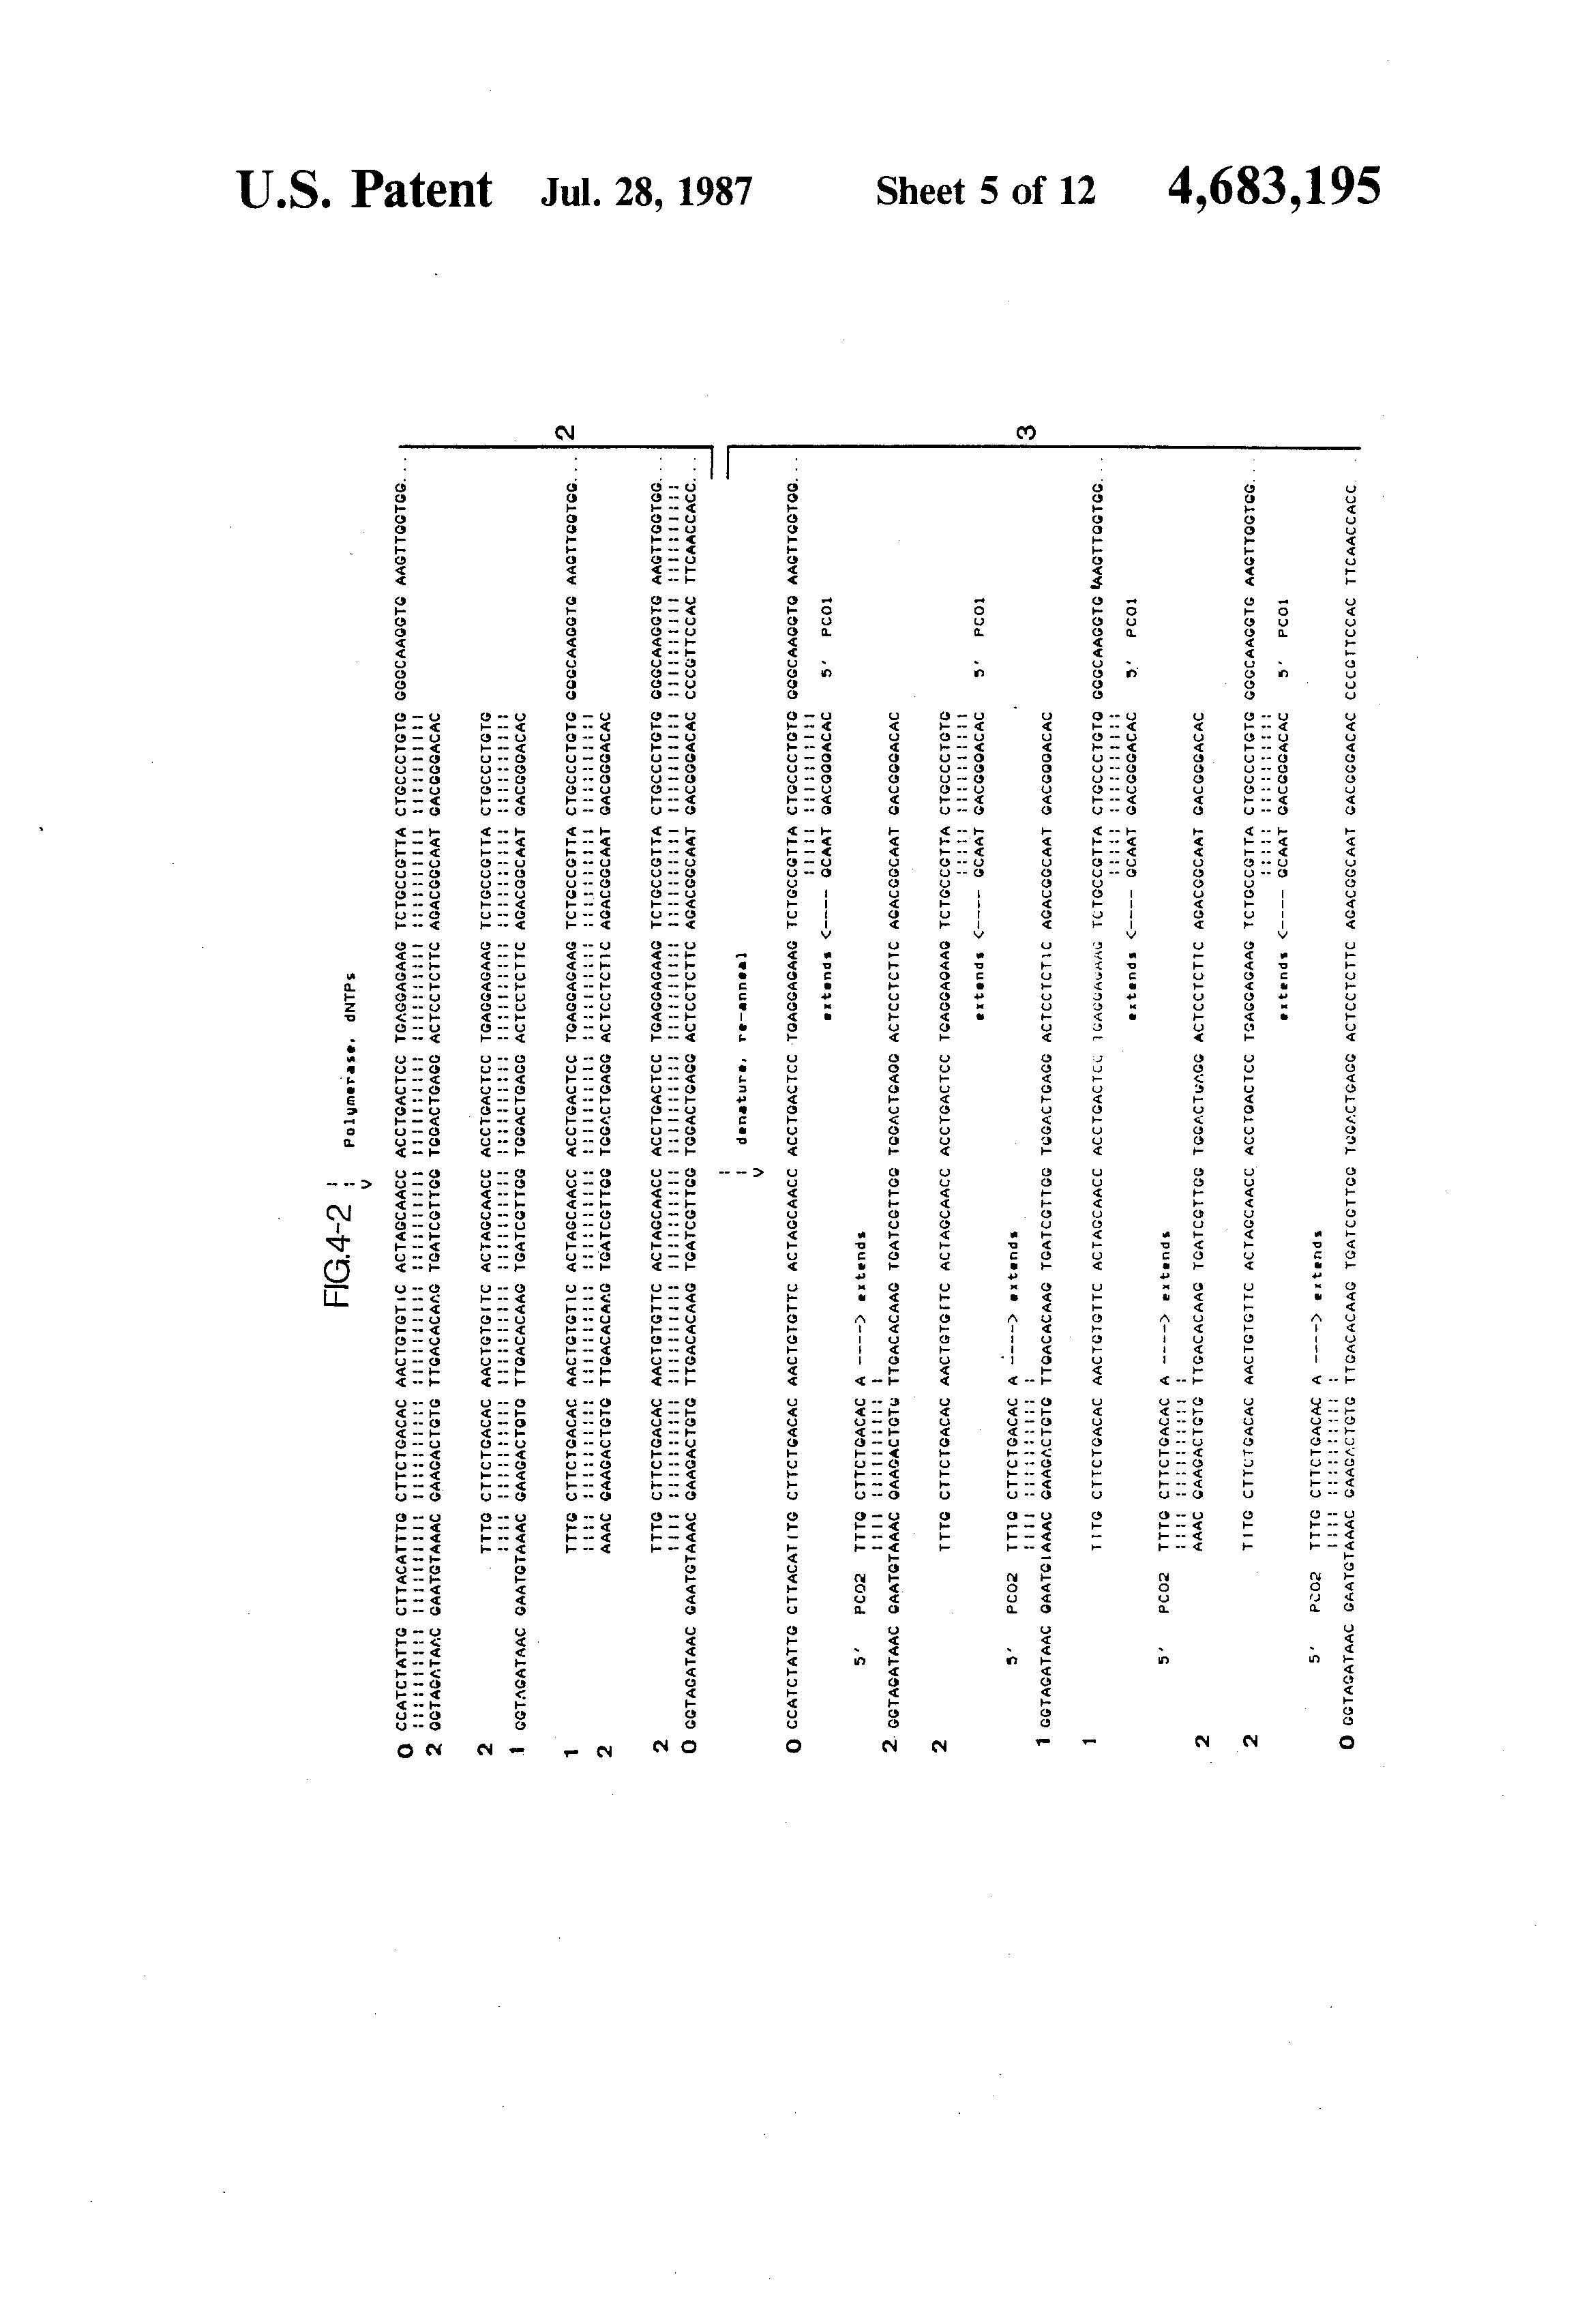 US4683195B1 Google Patents